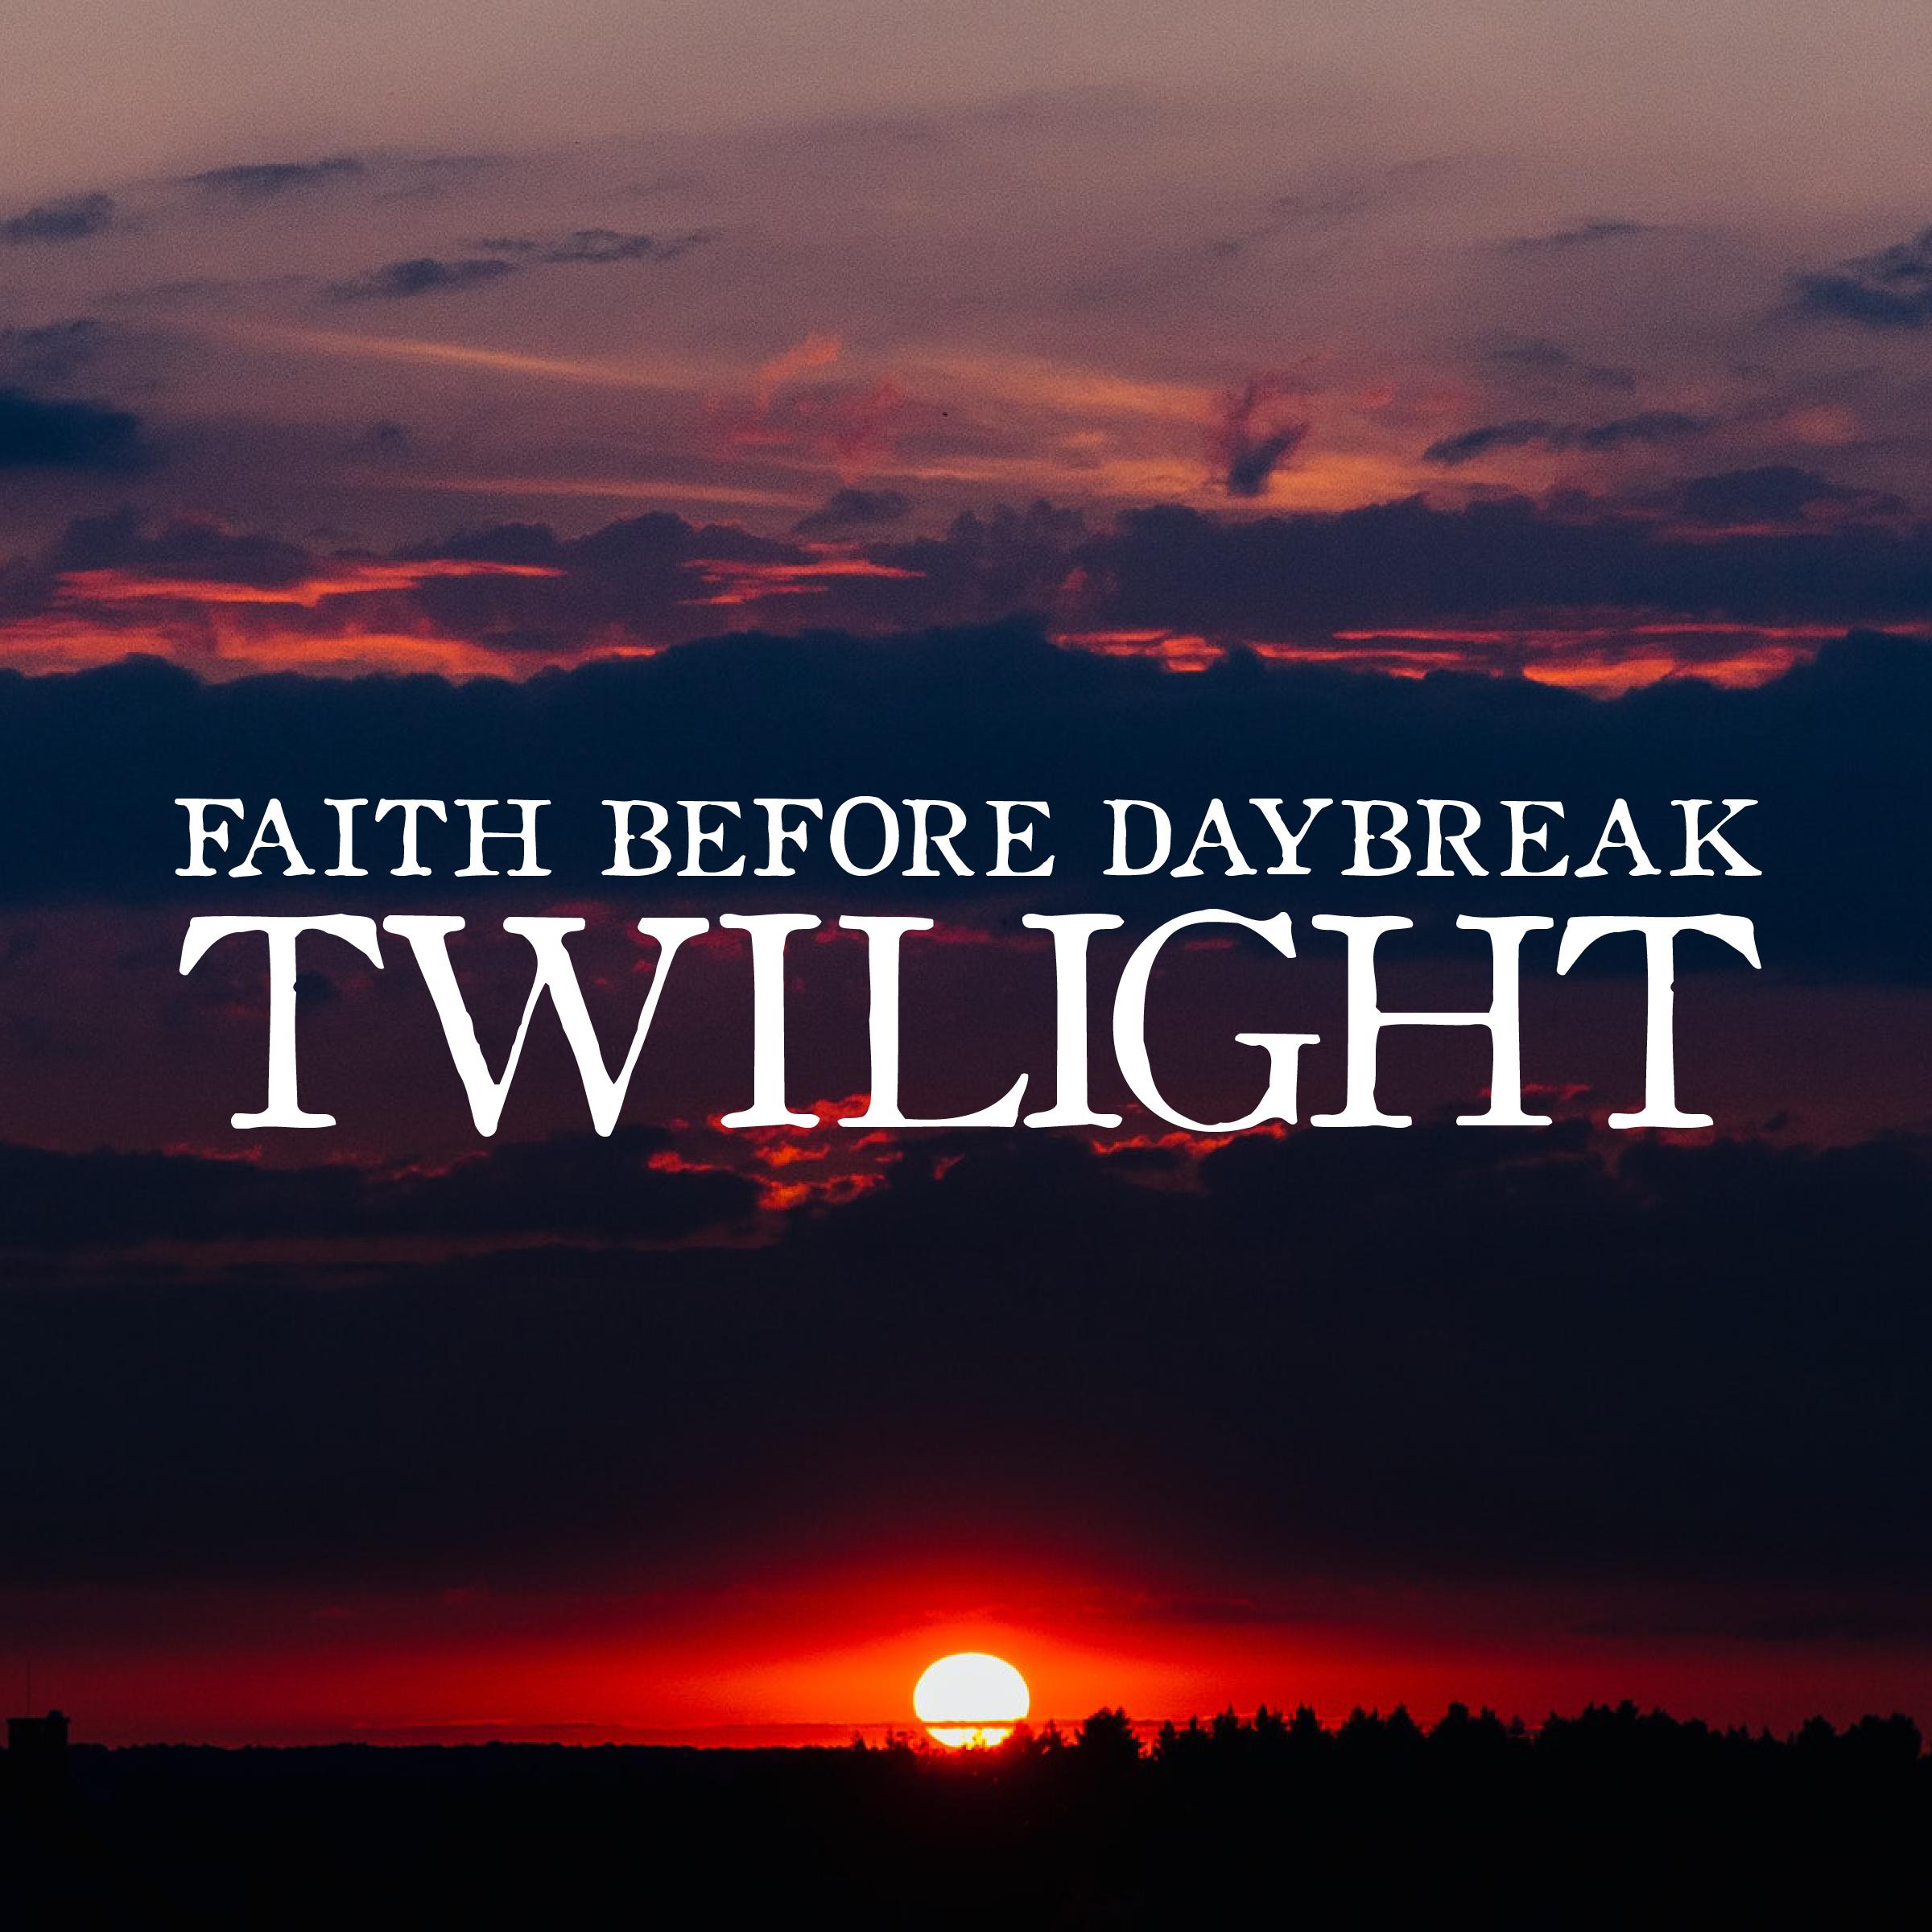 Faith Before Daybreak: Twilight